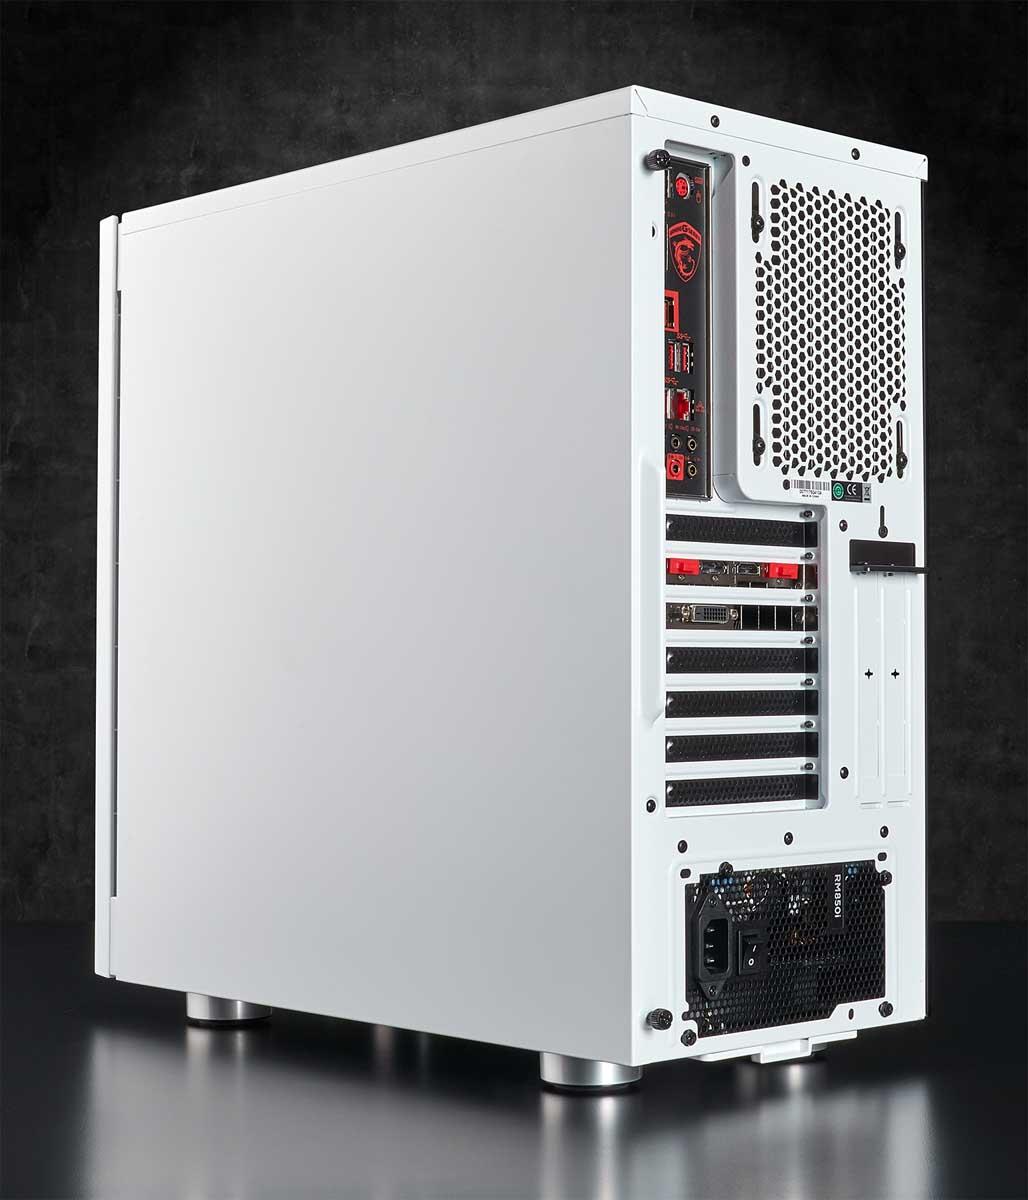 Corsair Launches Carbide Series 275r Pc Case Legit Reviews